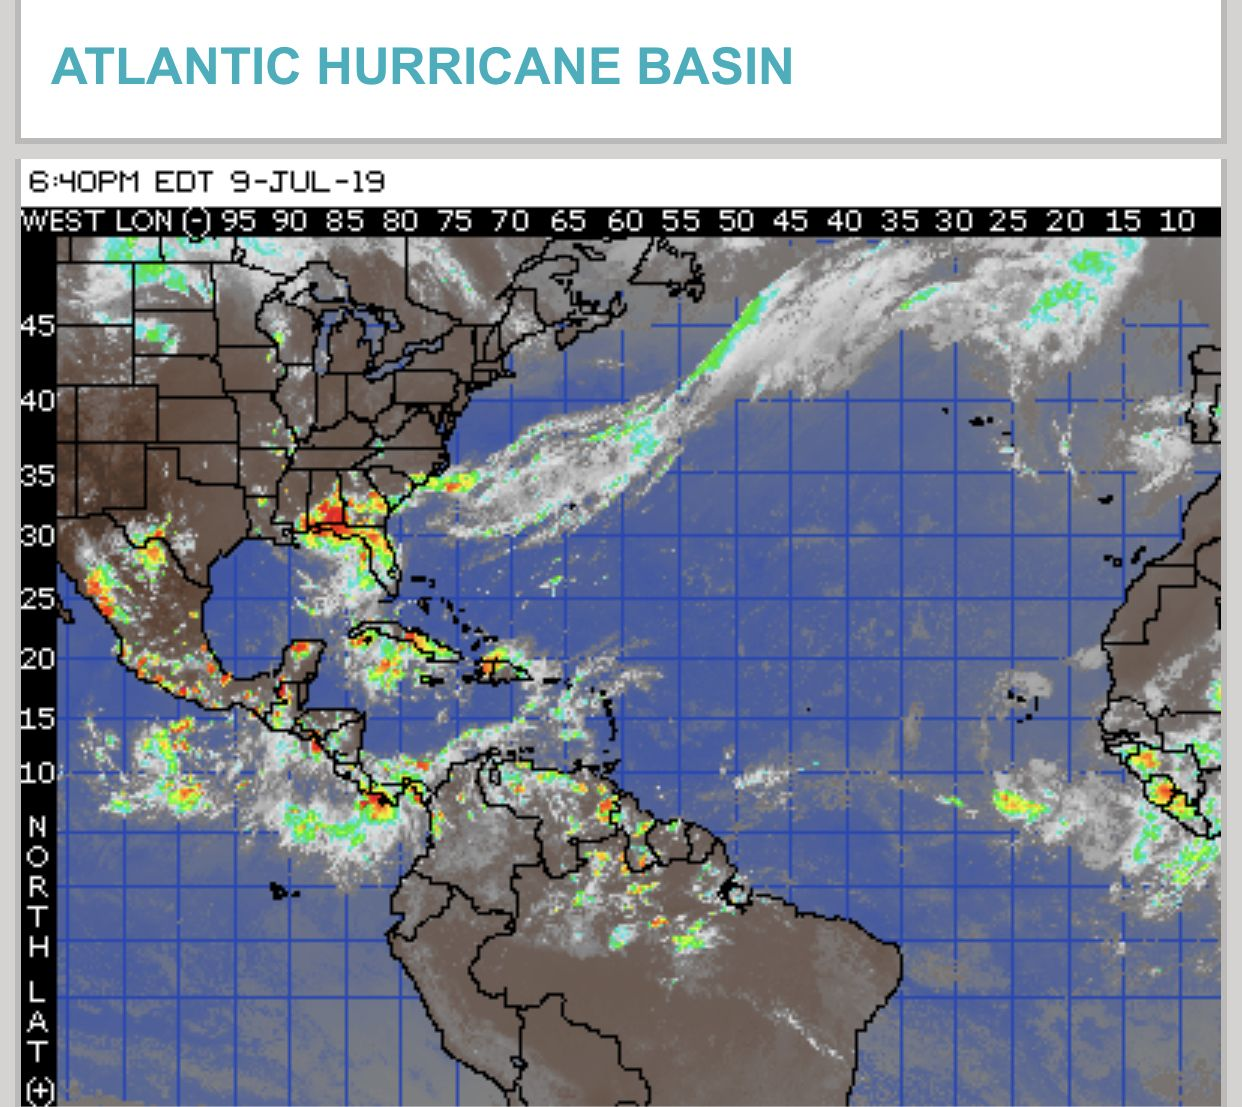 Pin By Carol Christ On Hurricane Preparedness In 2020 Hurricane Preparedness Preparedness Map Screenshot